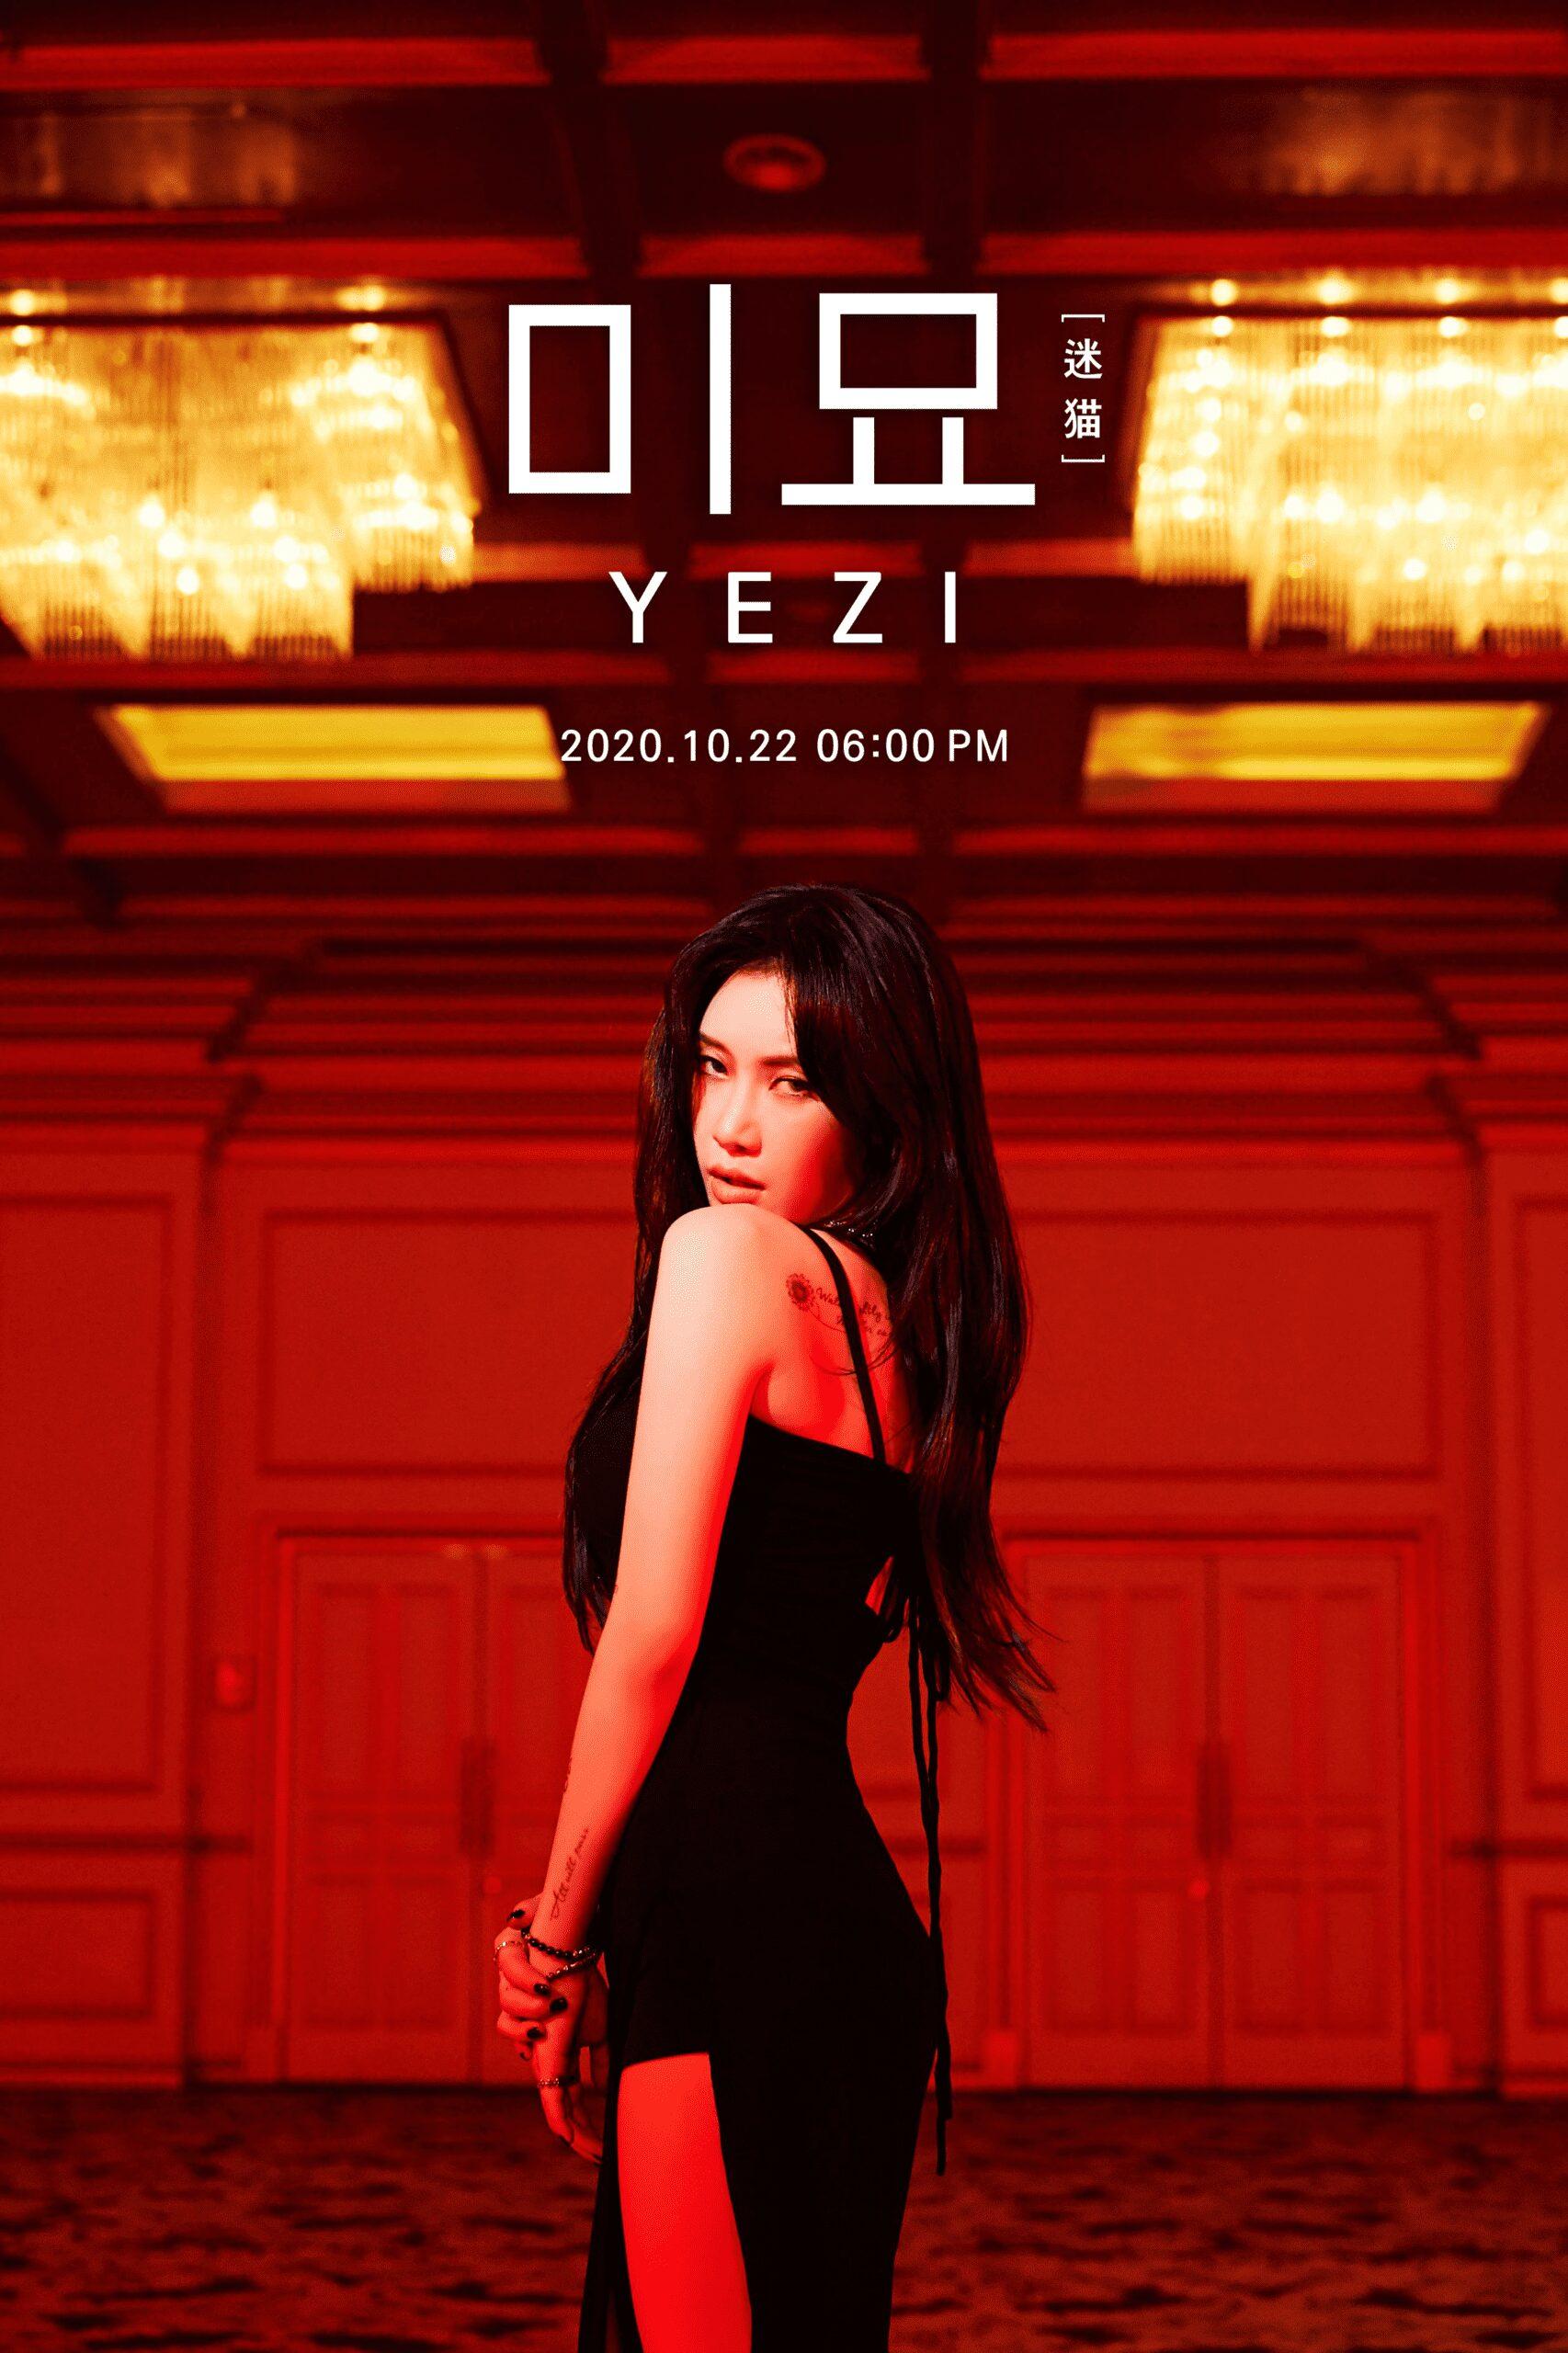 YEZI Returns